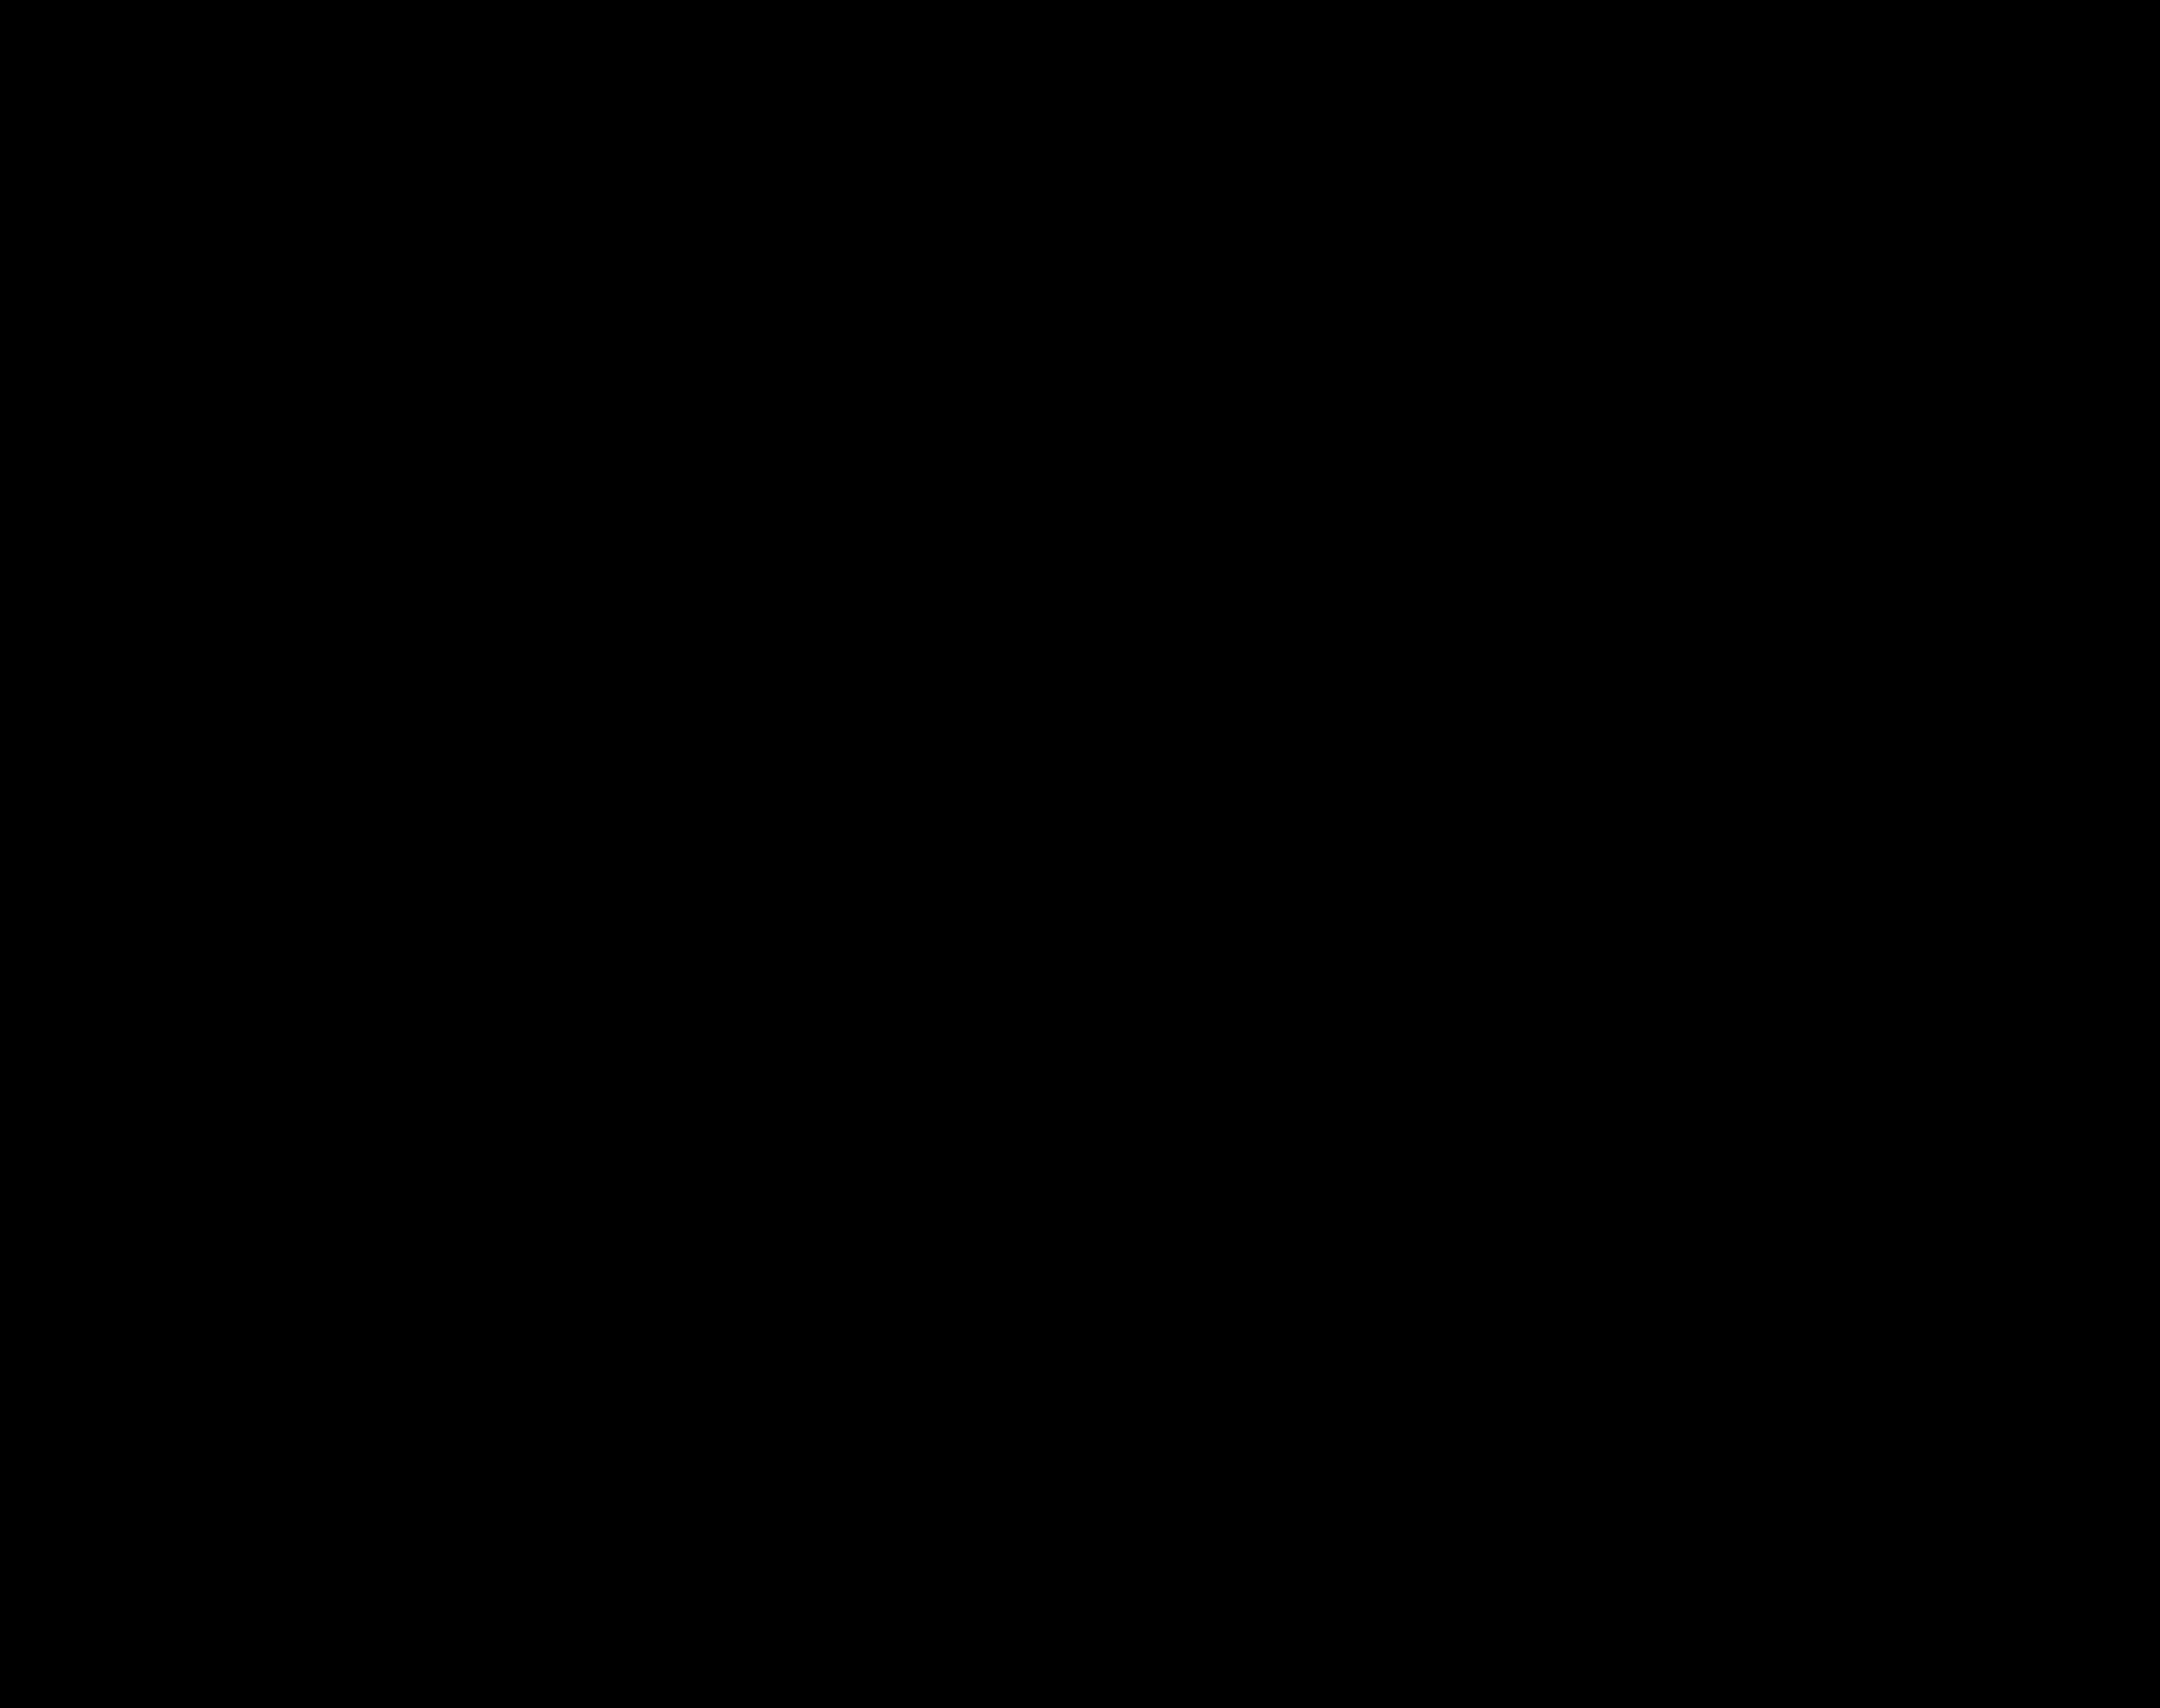 2400x1898 Clipart